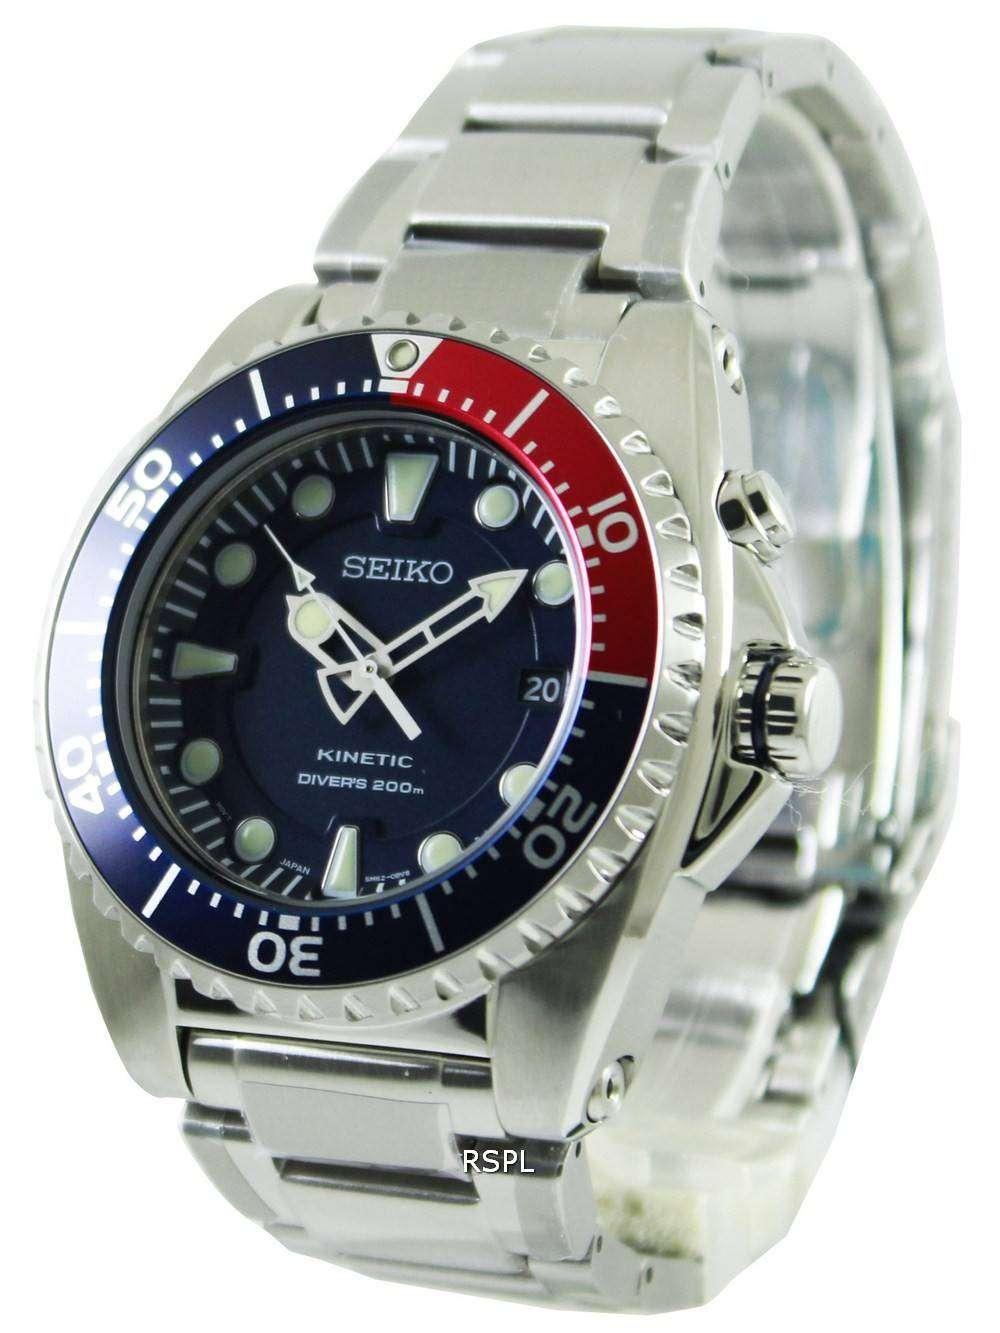 Seiko Kinetic Divers 200M SKA369P1 Watch